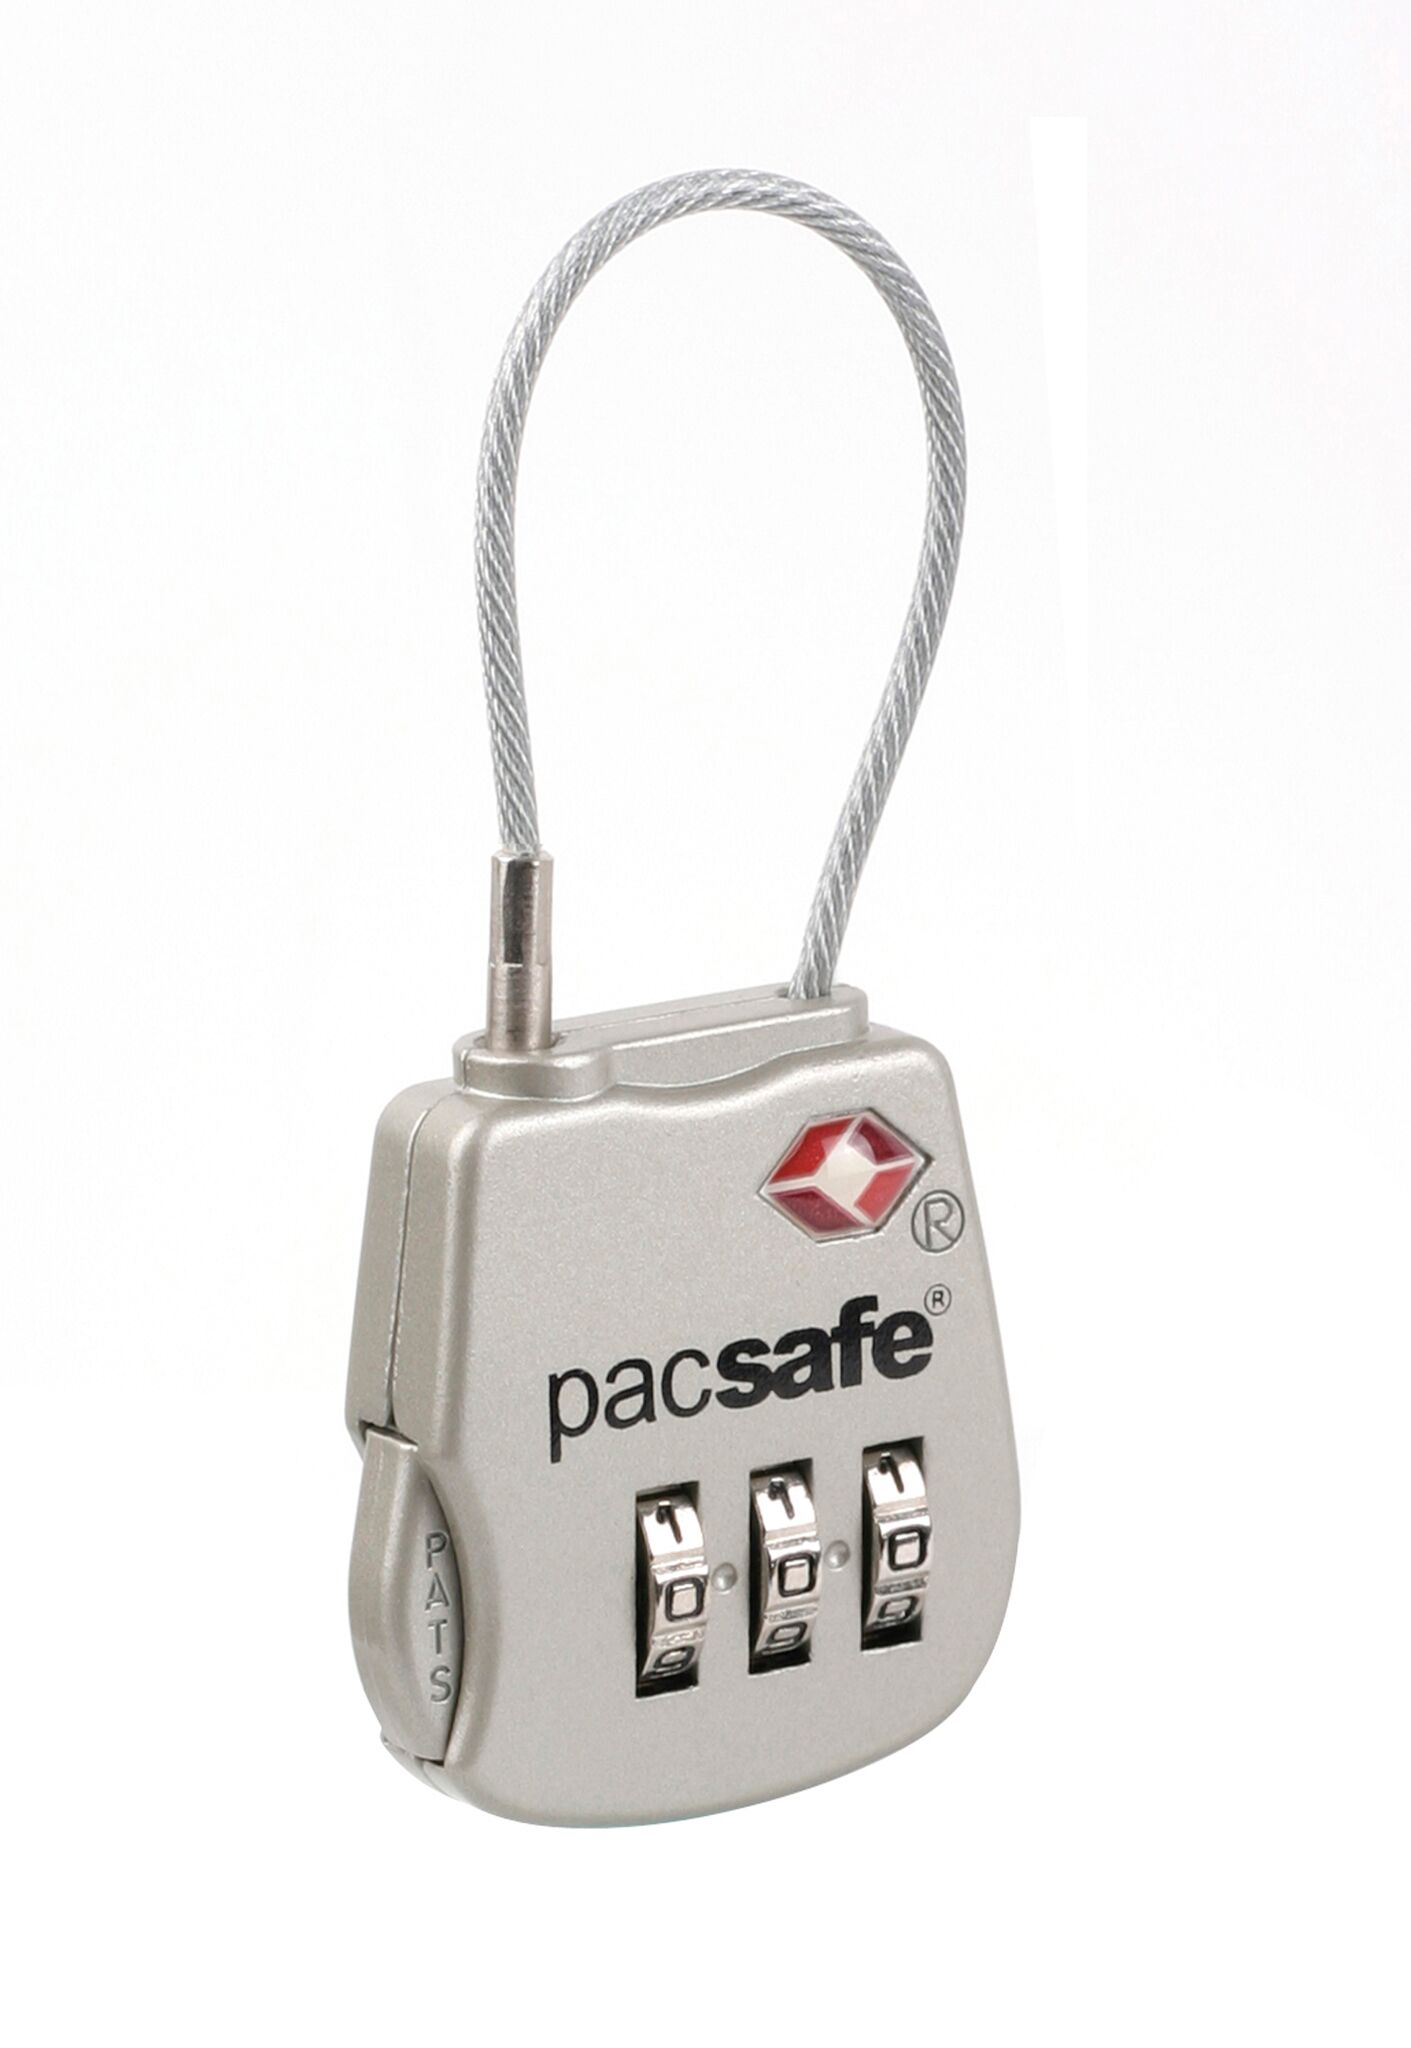 Prosafe 800 TSA kode wirelås